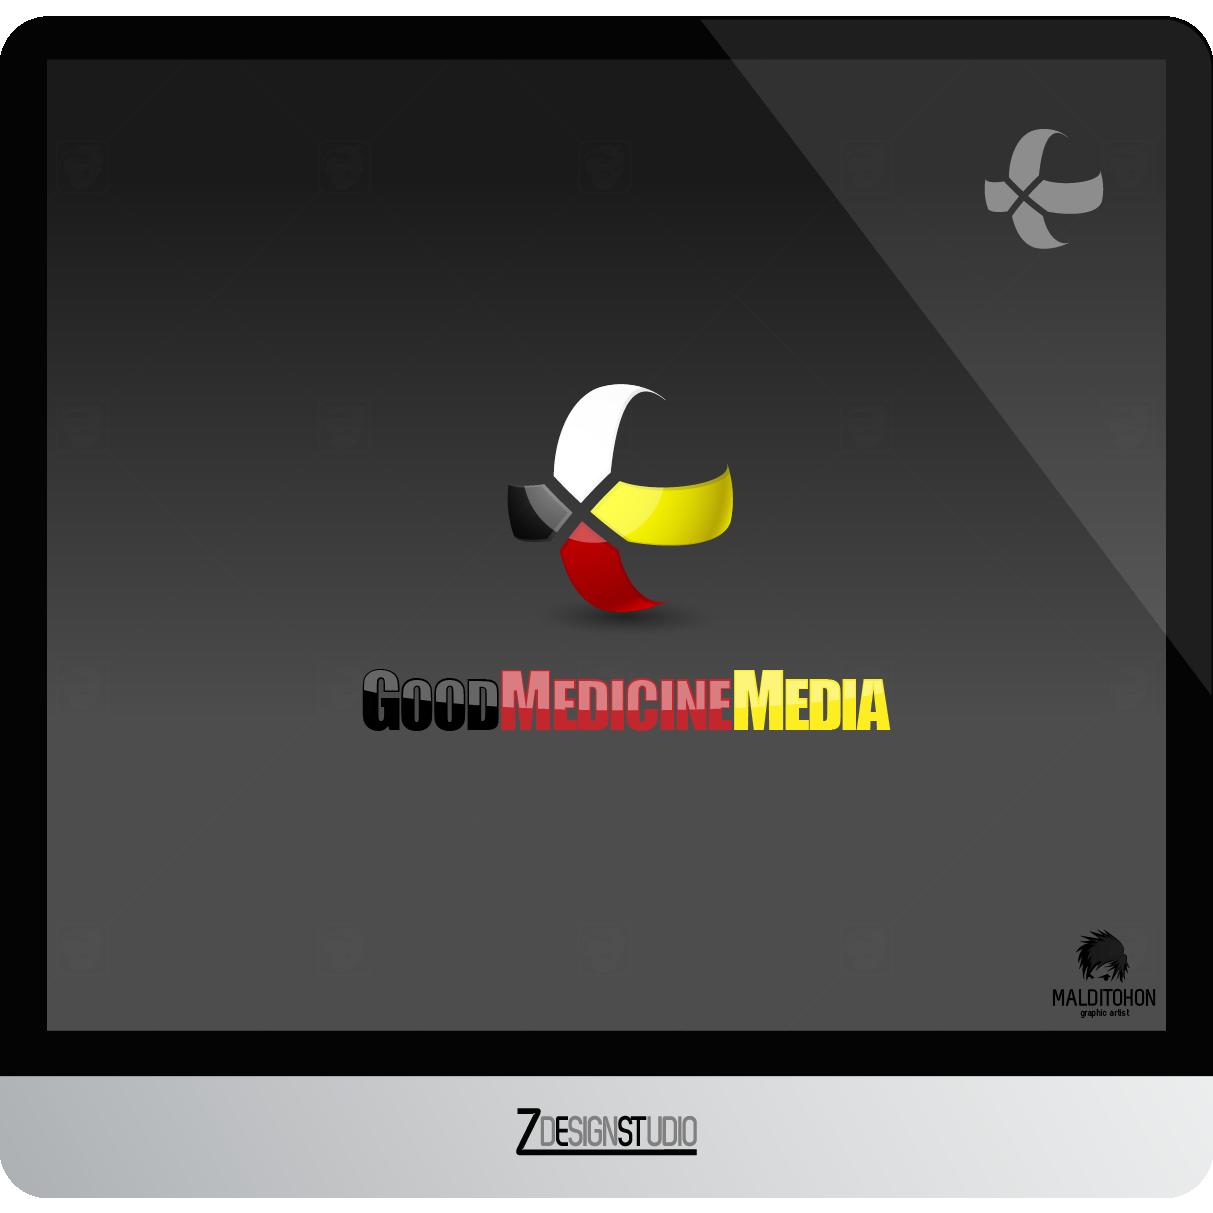 Logo Design by zesthar - Entry No. 153 in the Logo Design Contest Good Medicine Media Logo Design.